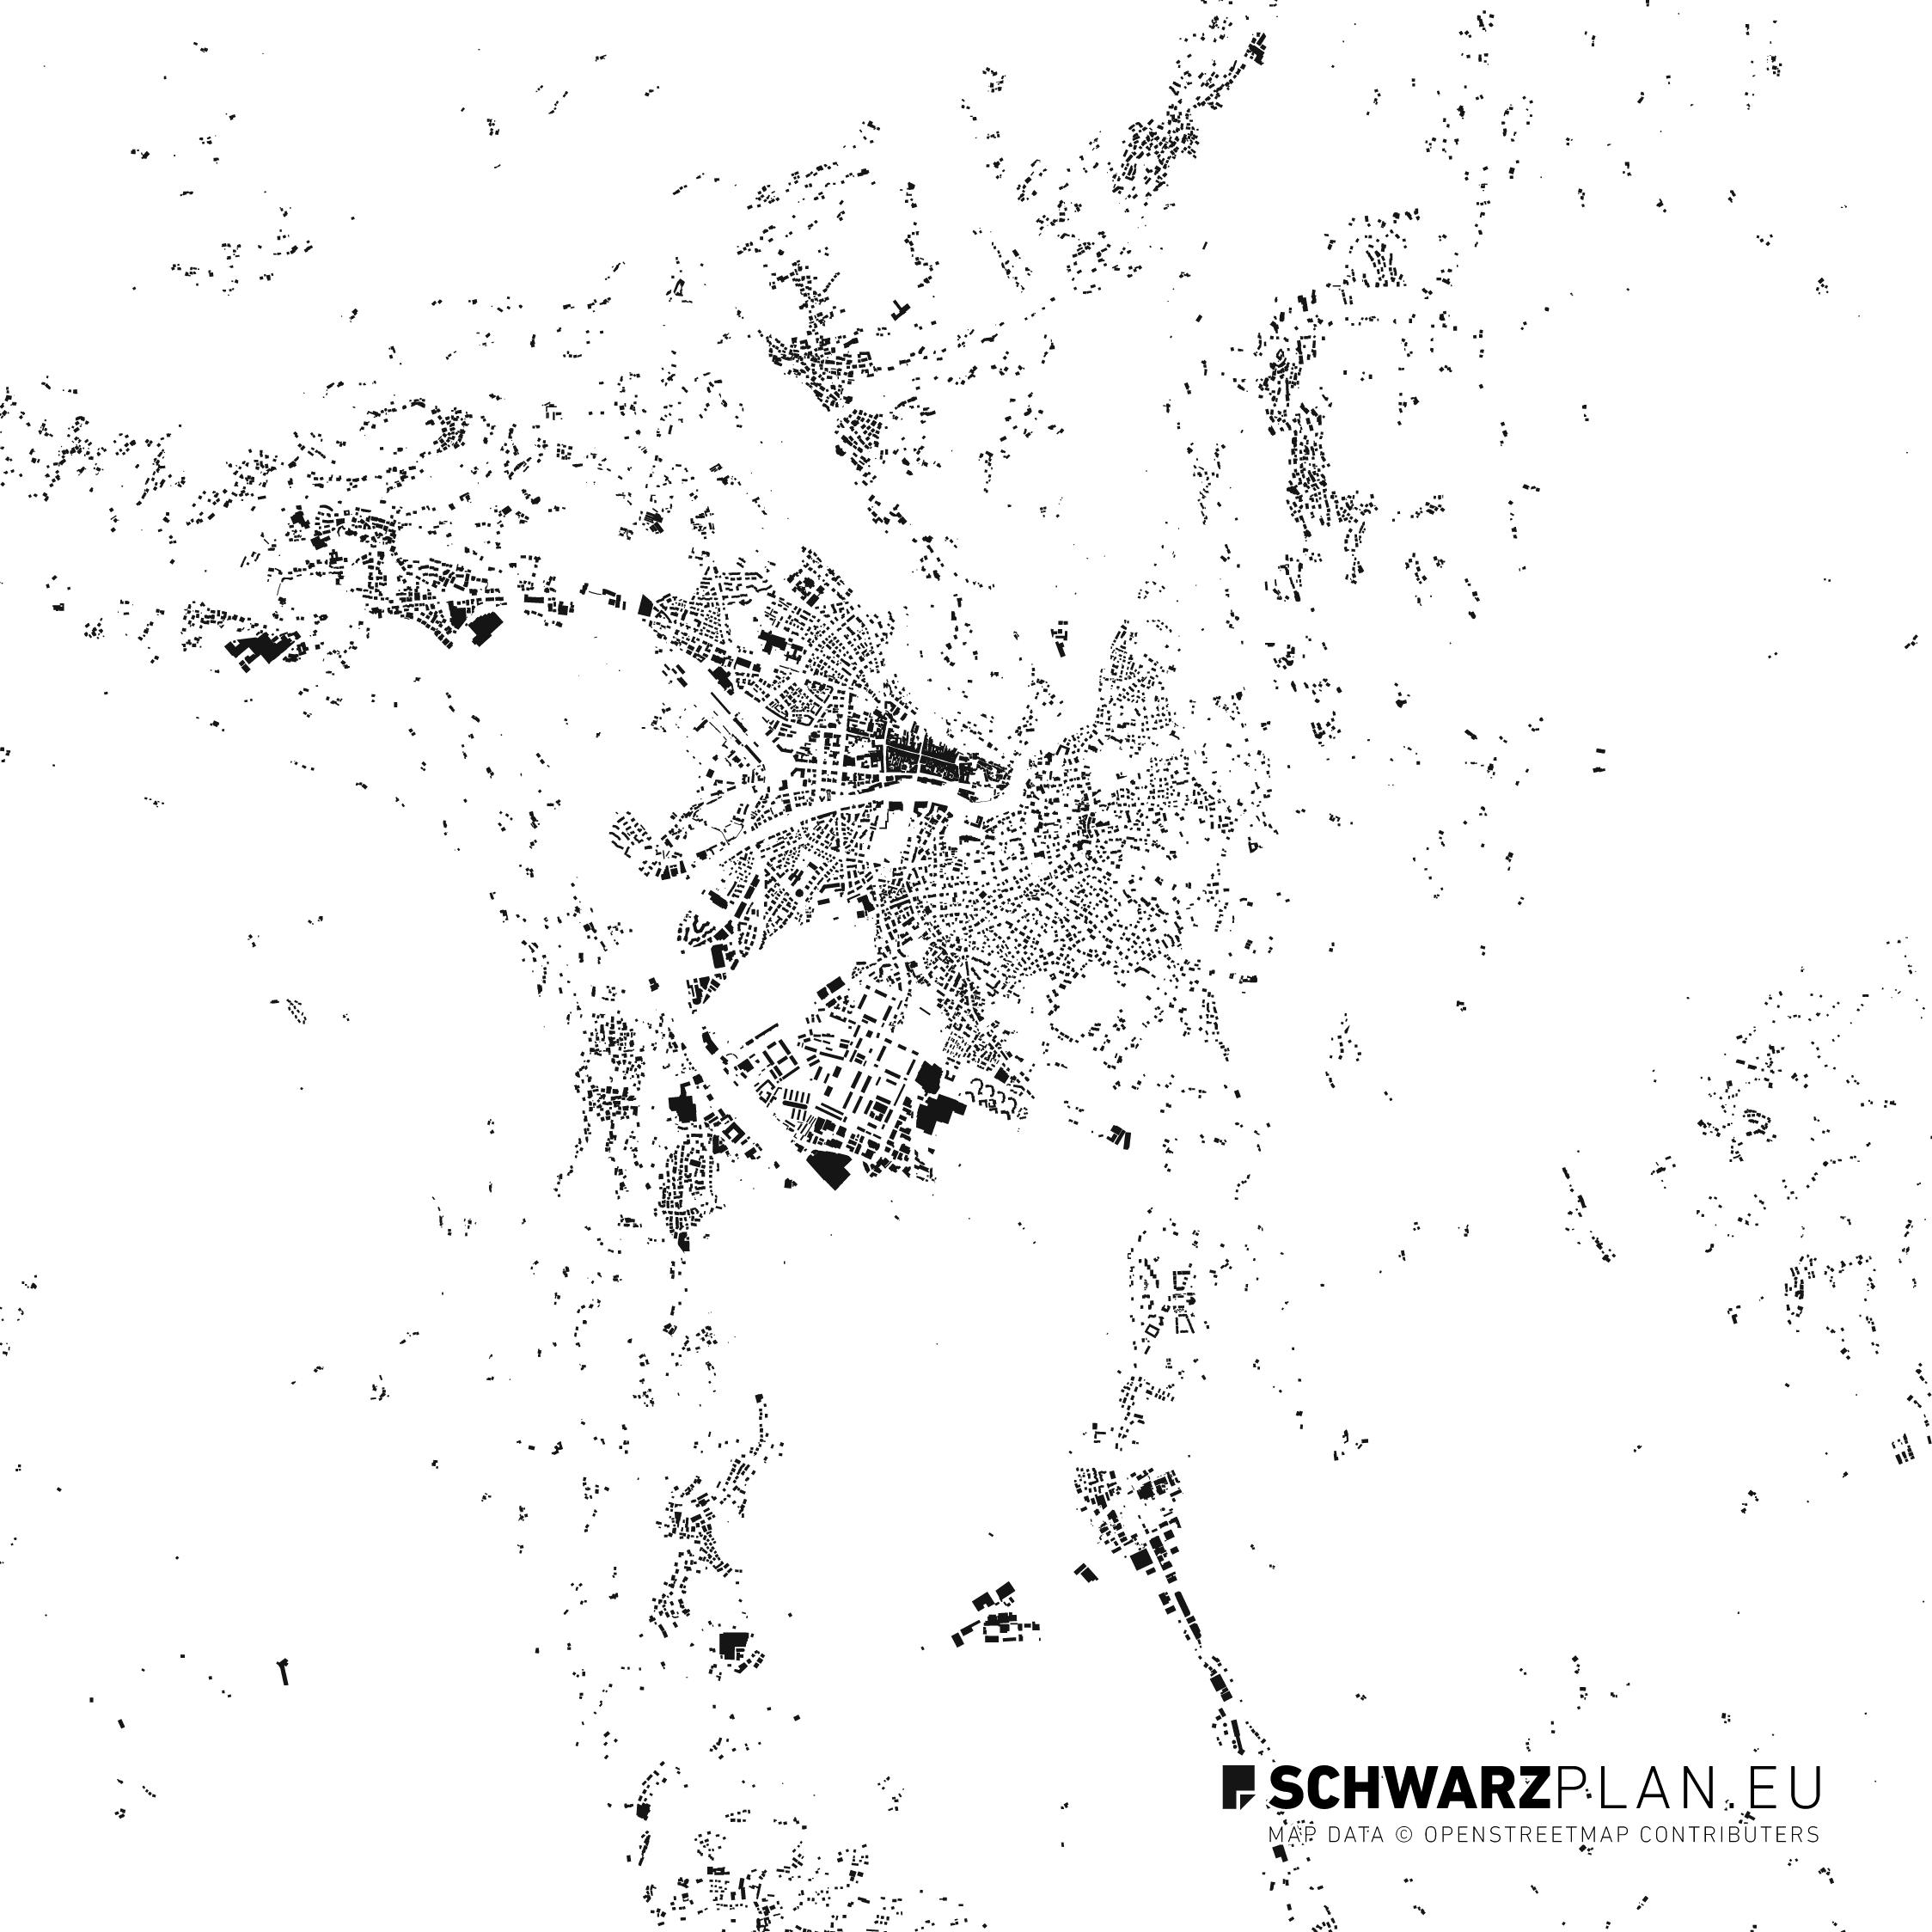 Figure ground plan of Meran